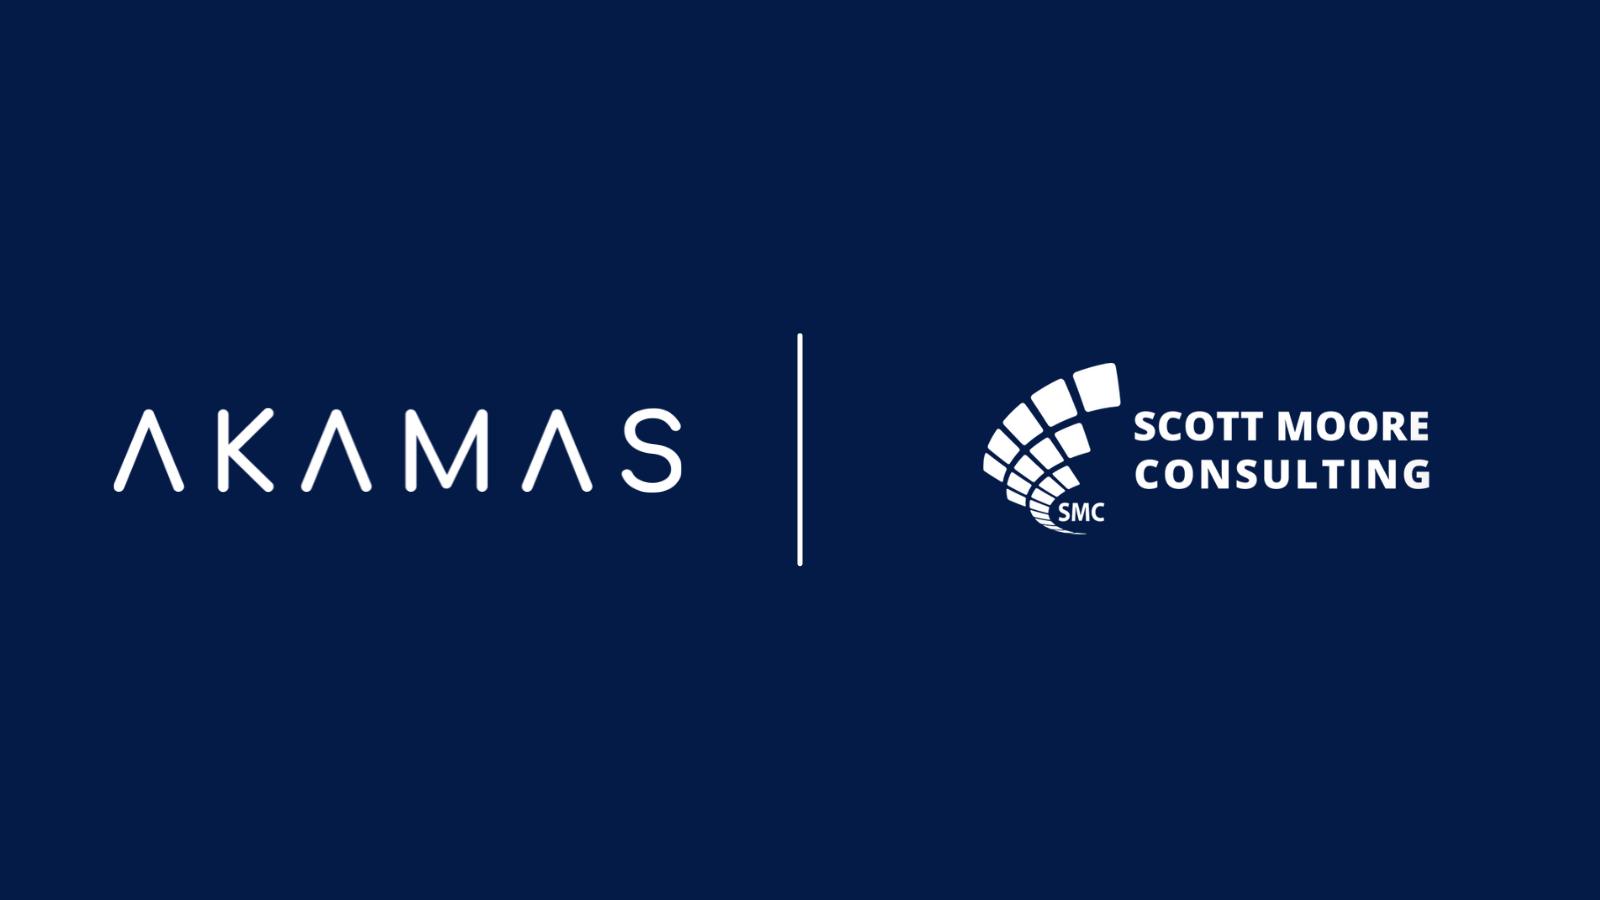 Akamas Scott Moore partnership